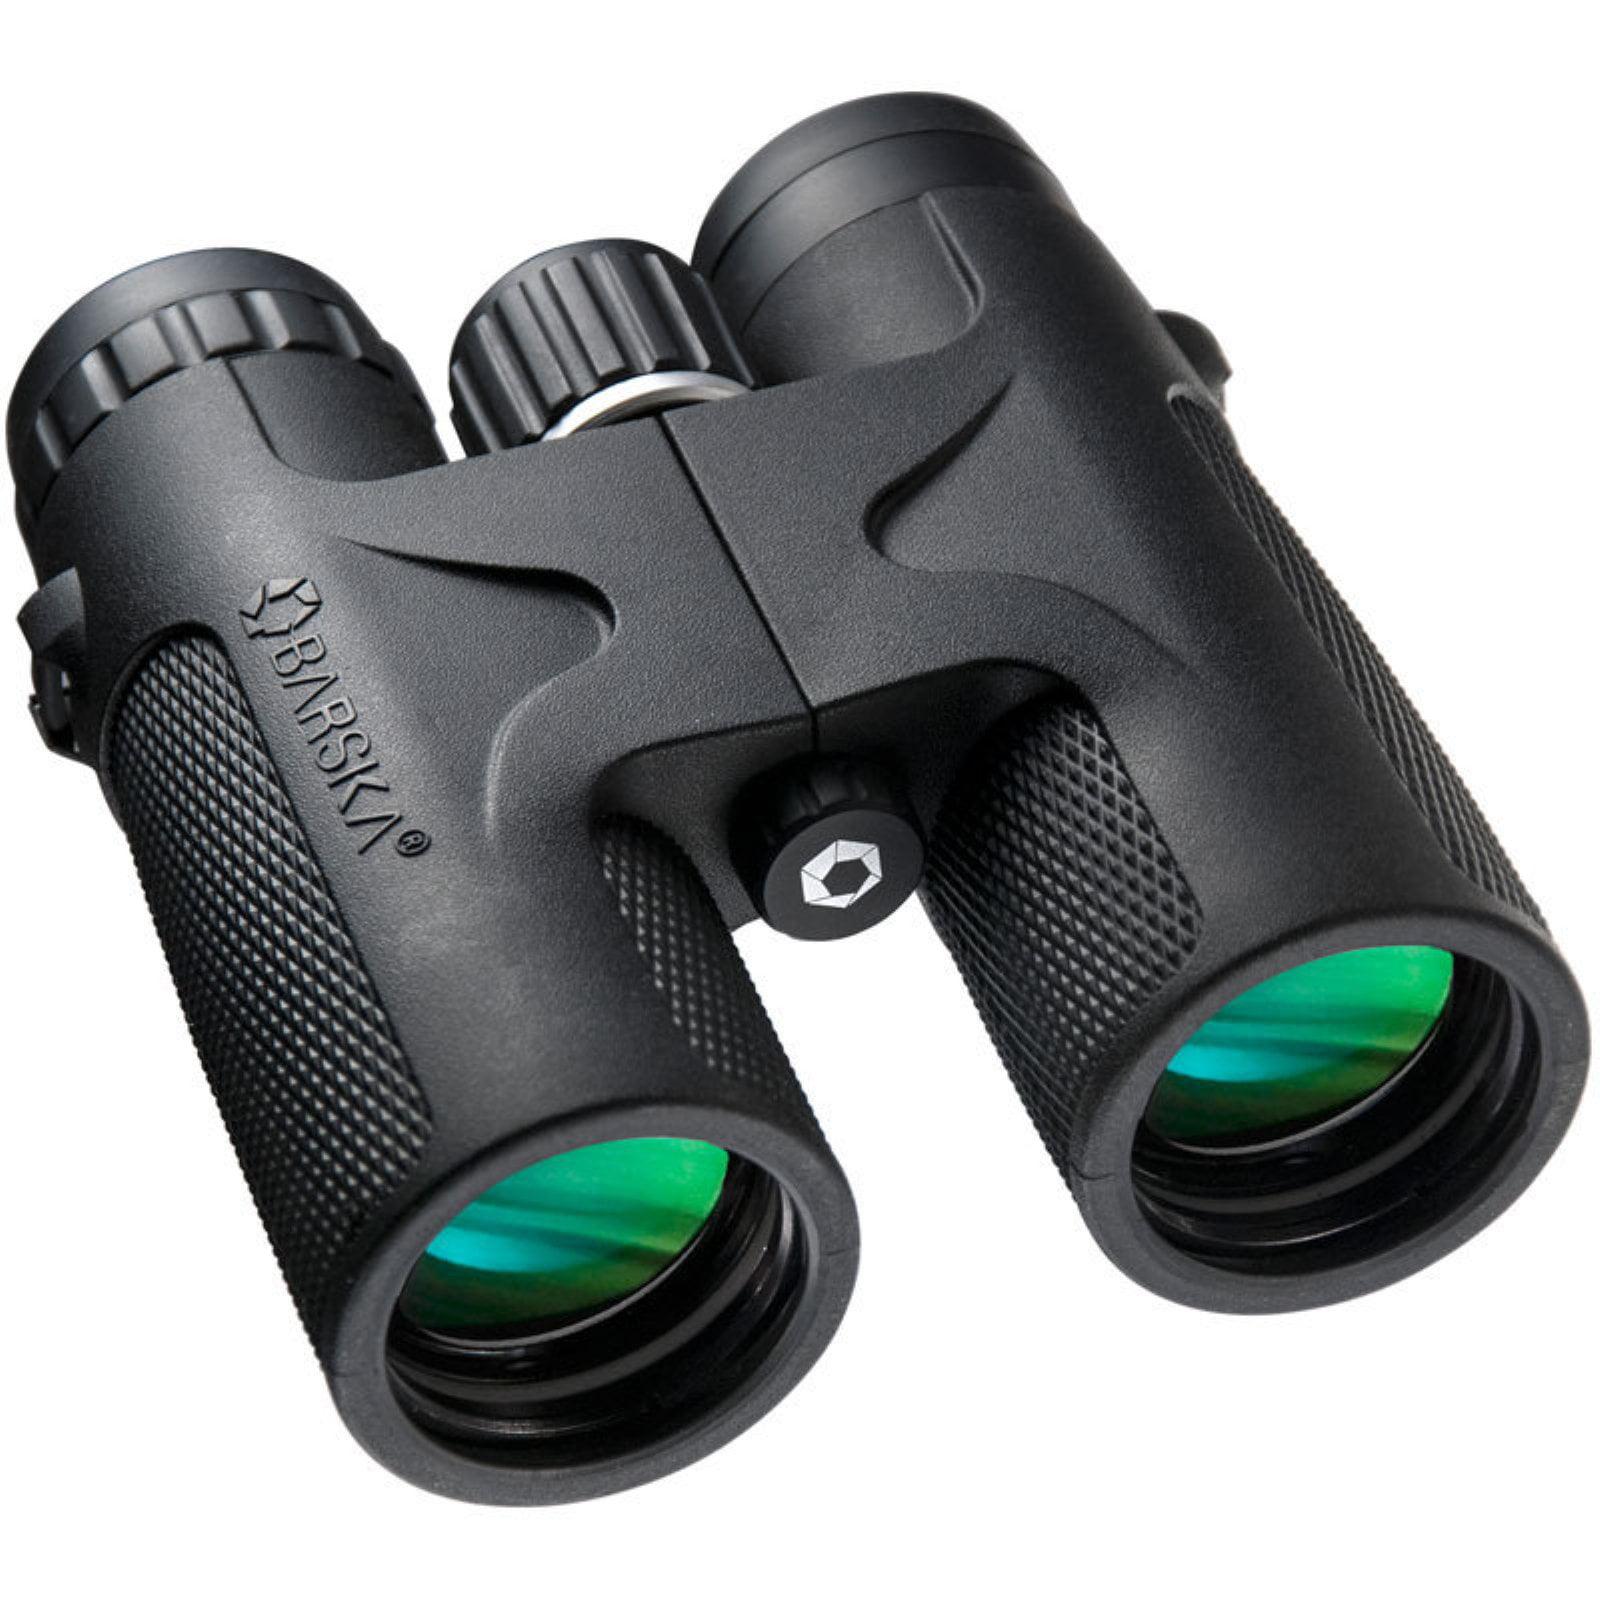 Barska 12x42 WP, Blackhawk Green Lens Binoculars